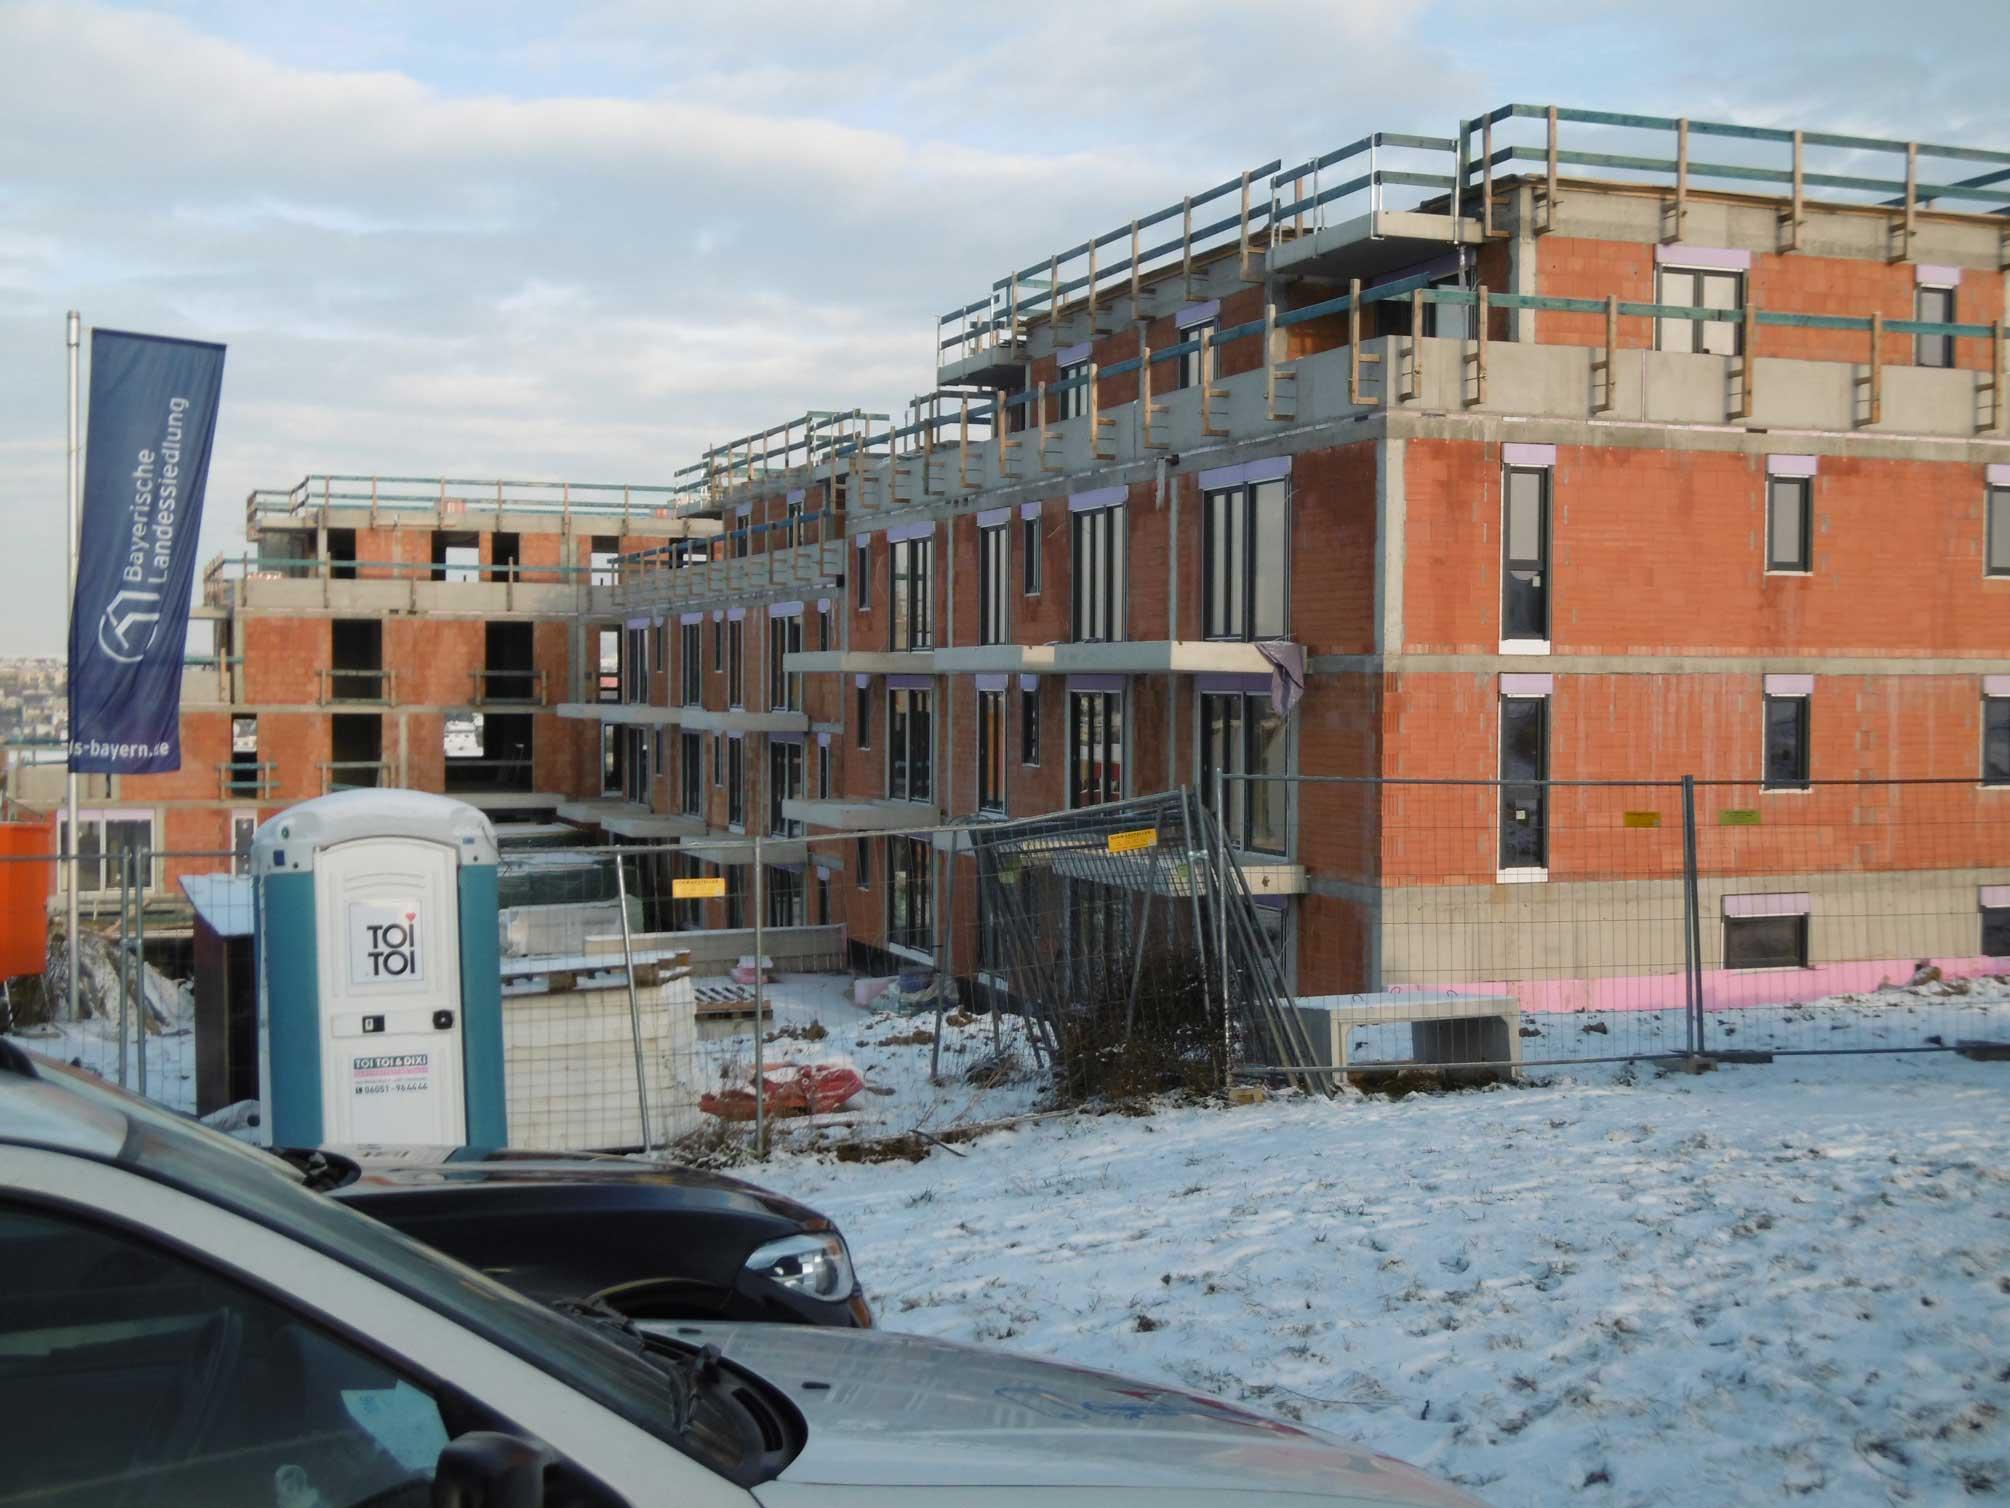 Würzburg Baustelle im Februar 2016